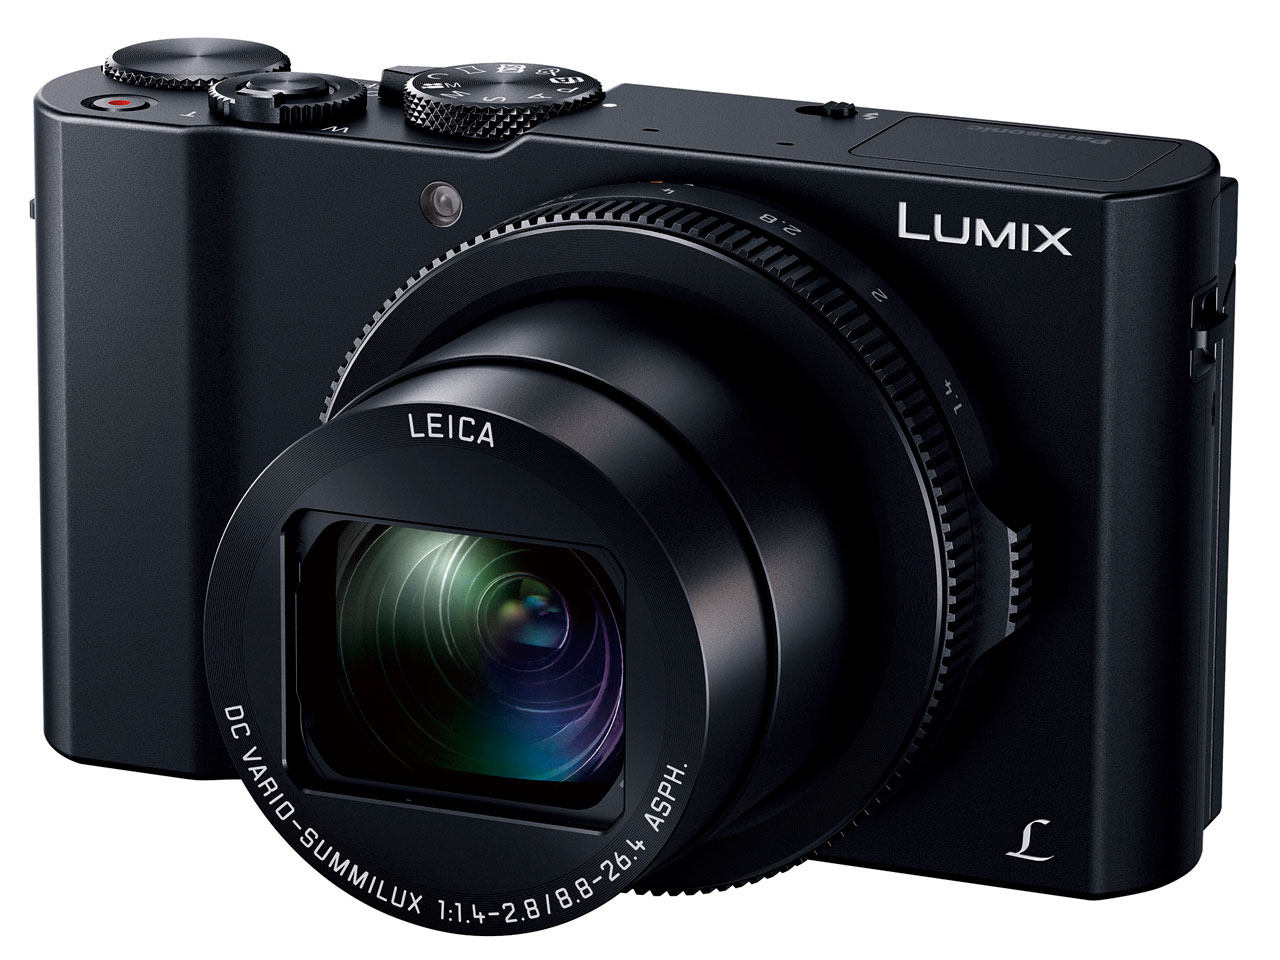 LUMIX DMC-LX9 の製品画像